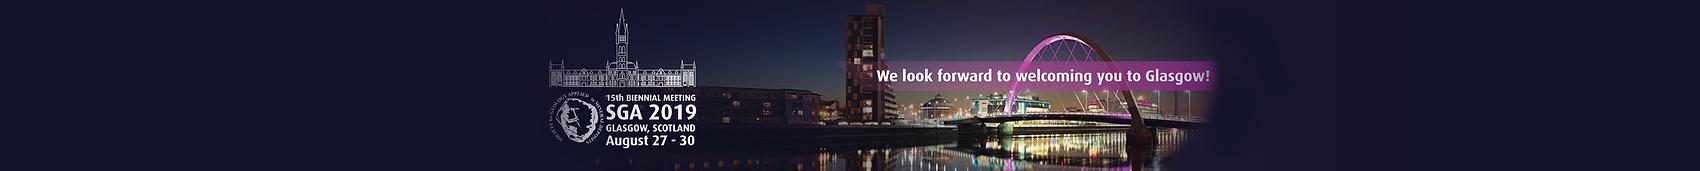 SGA 2019 Glasgow